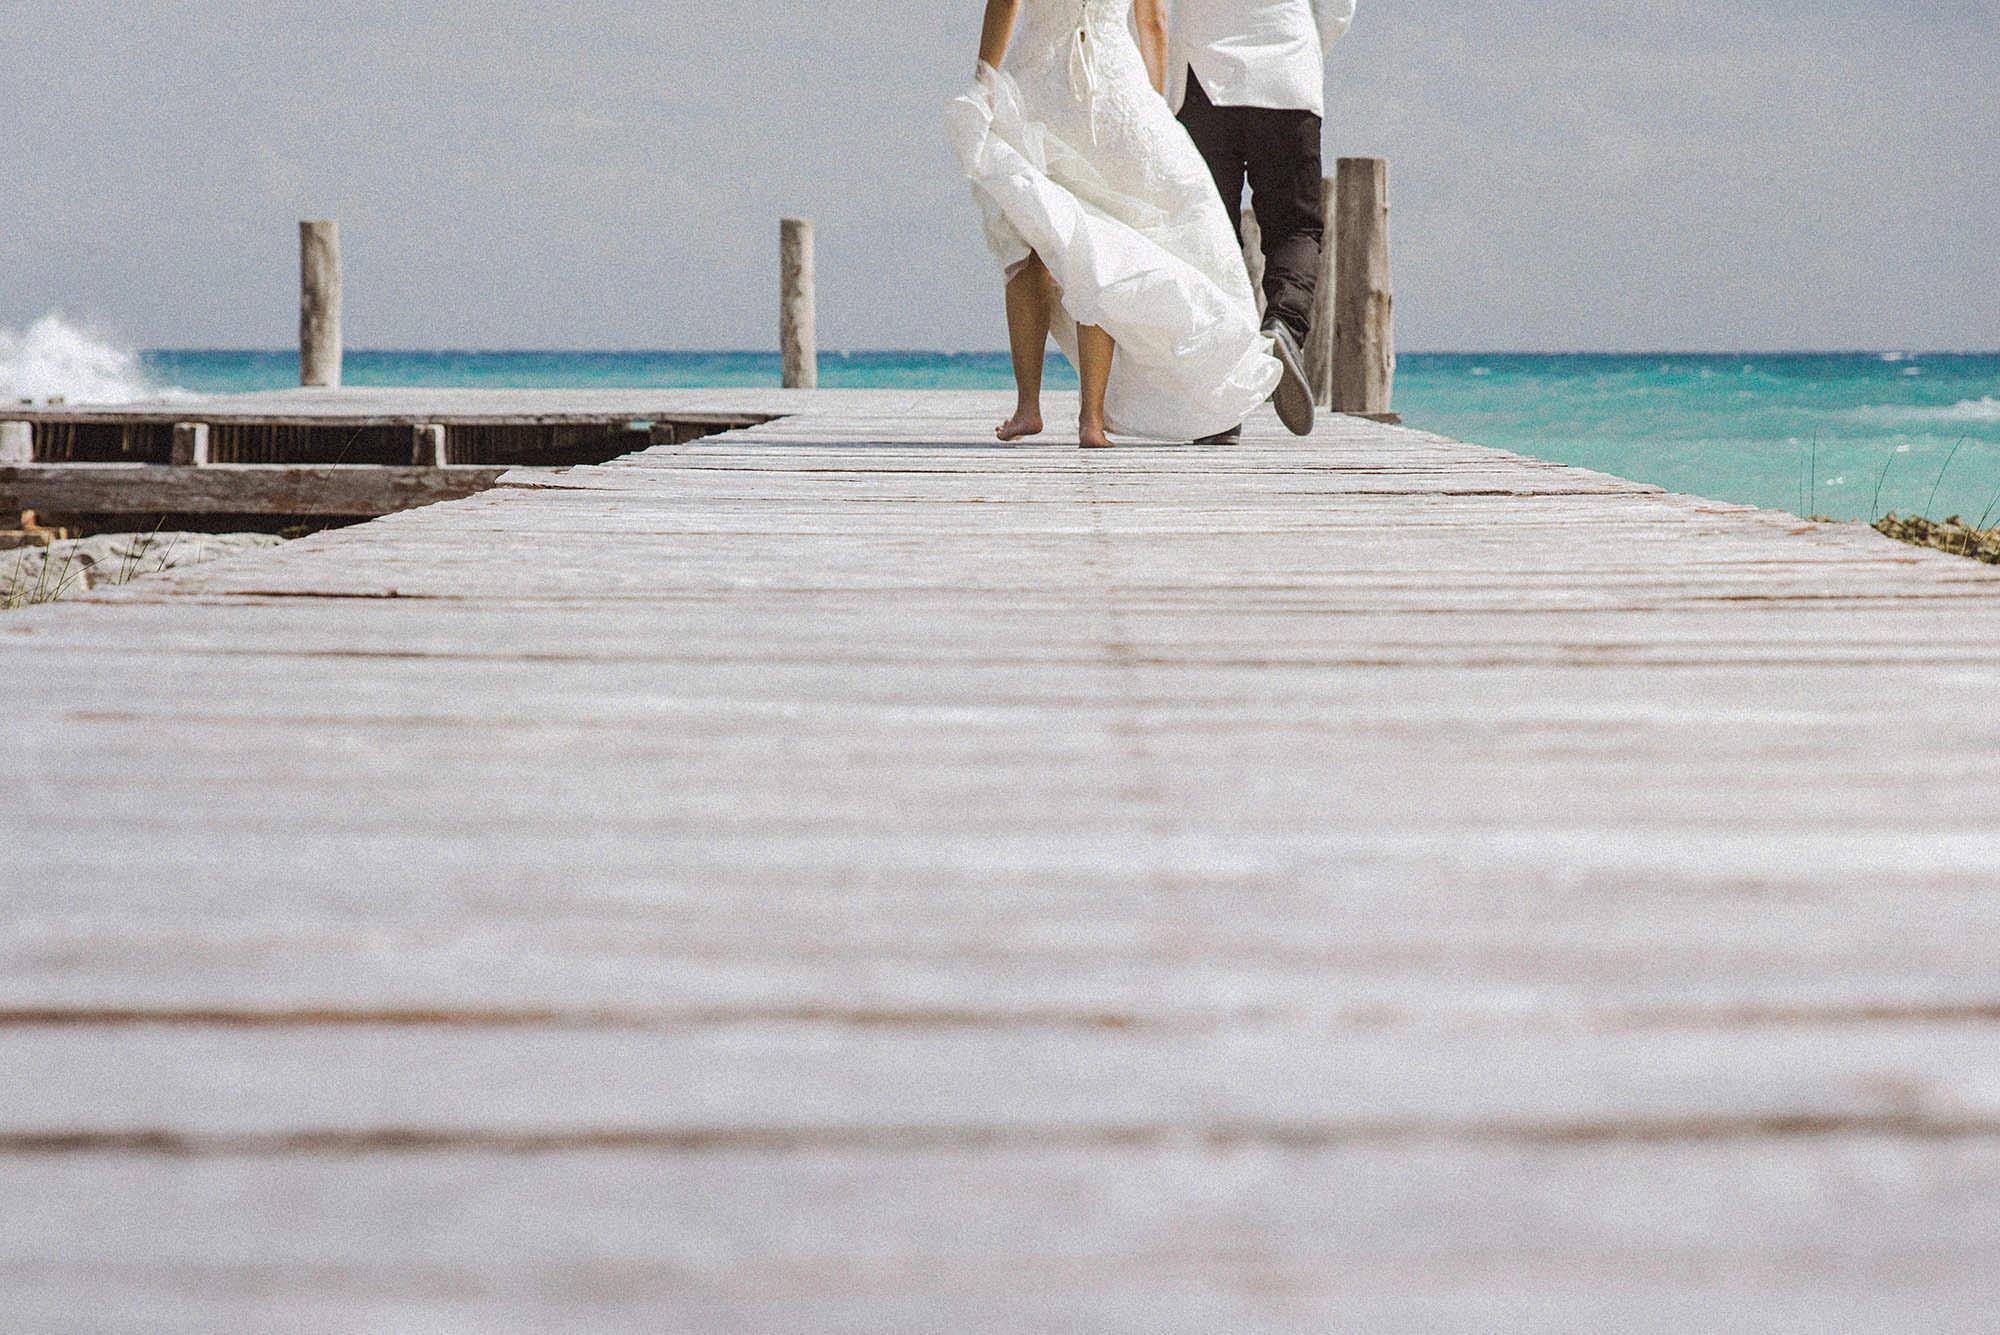 Wedding playa del carmen planner destination mexico magali espinosa26-WEB.jpg